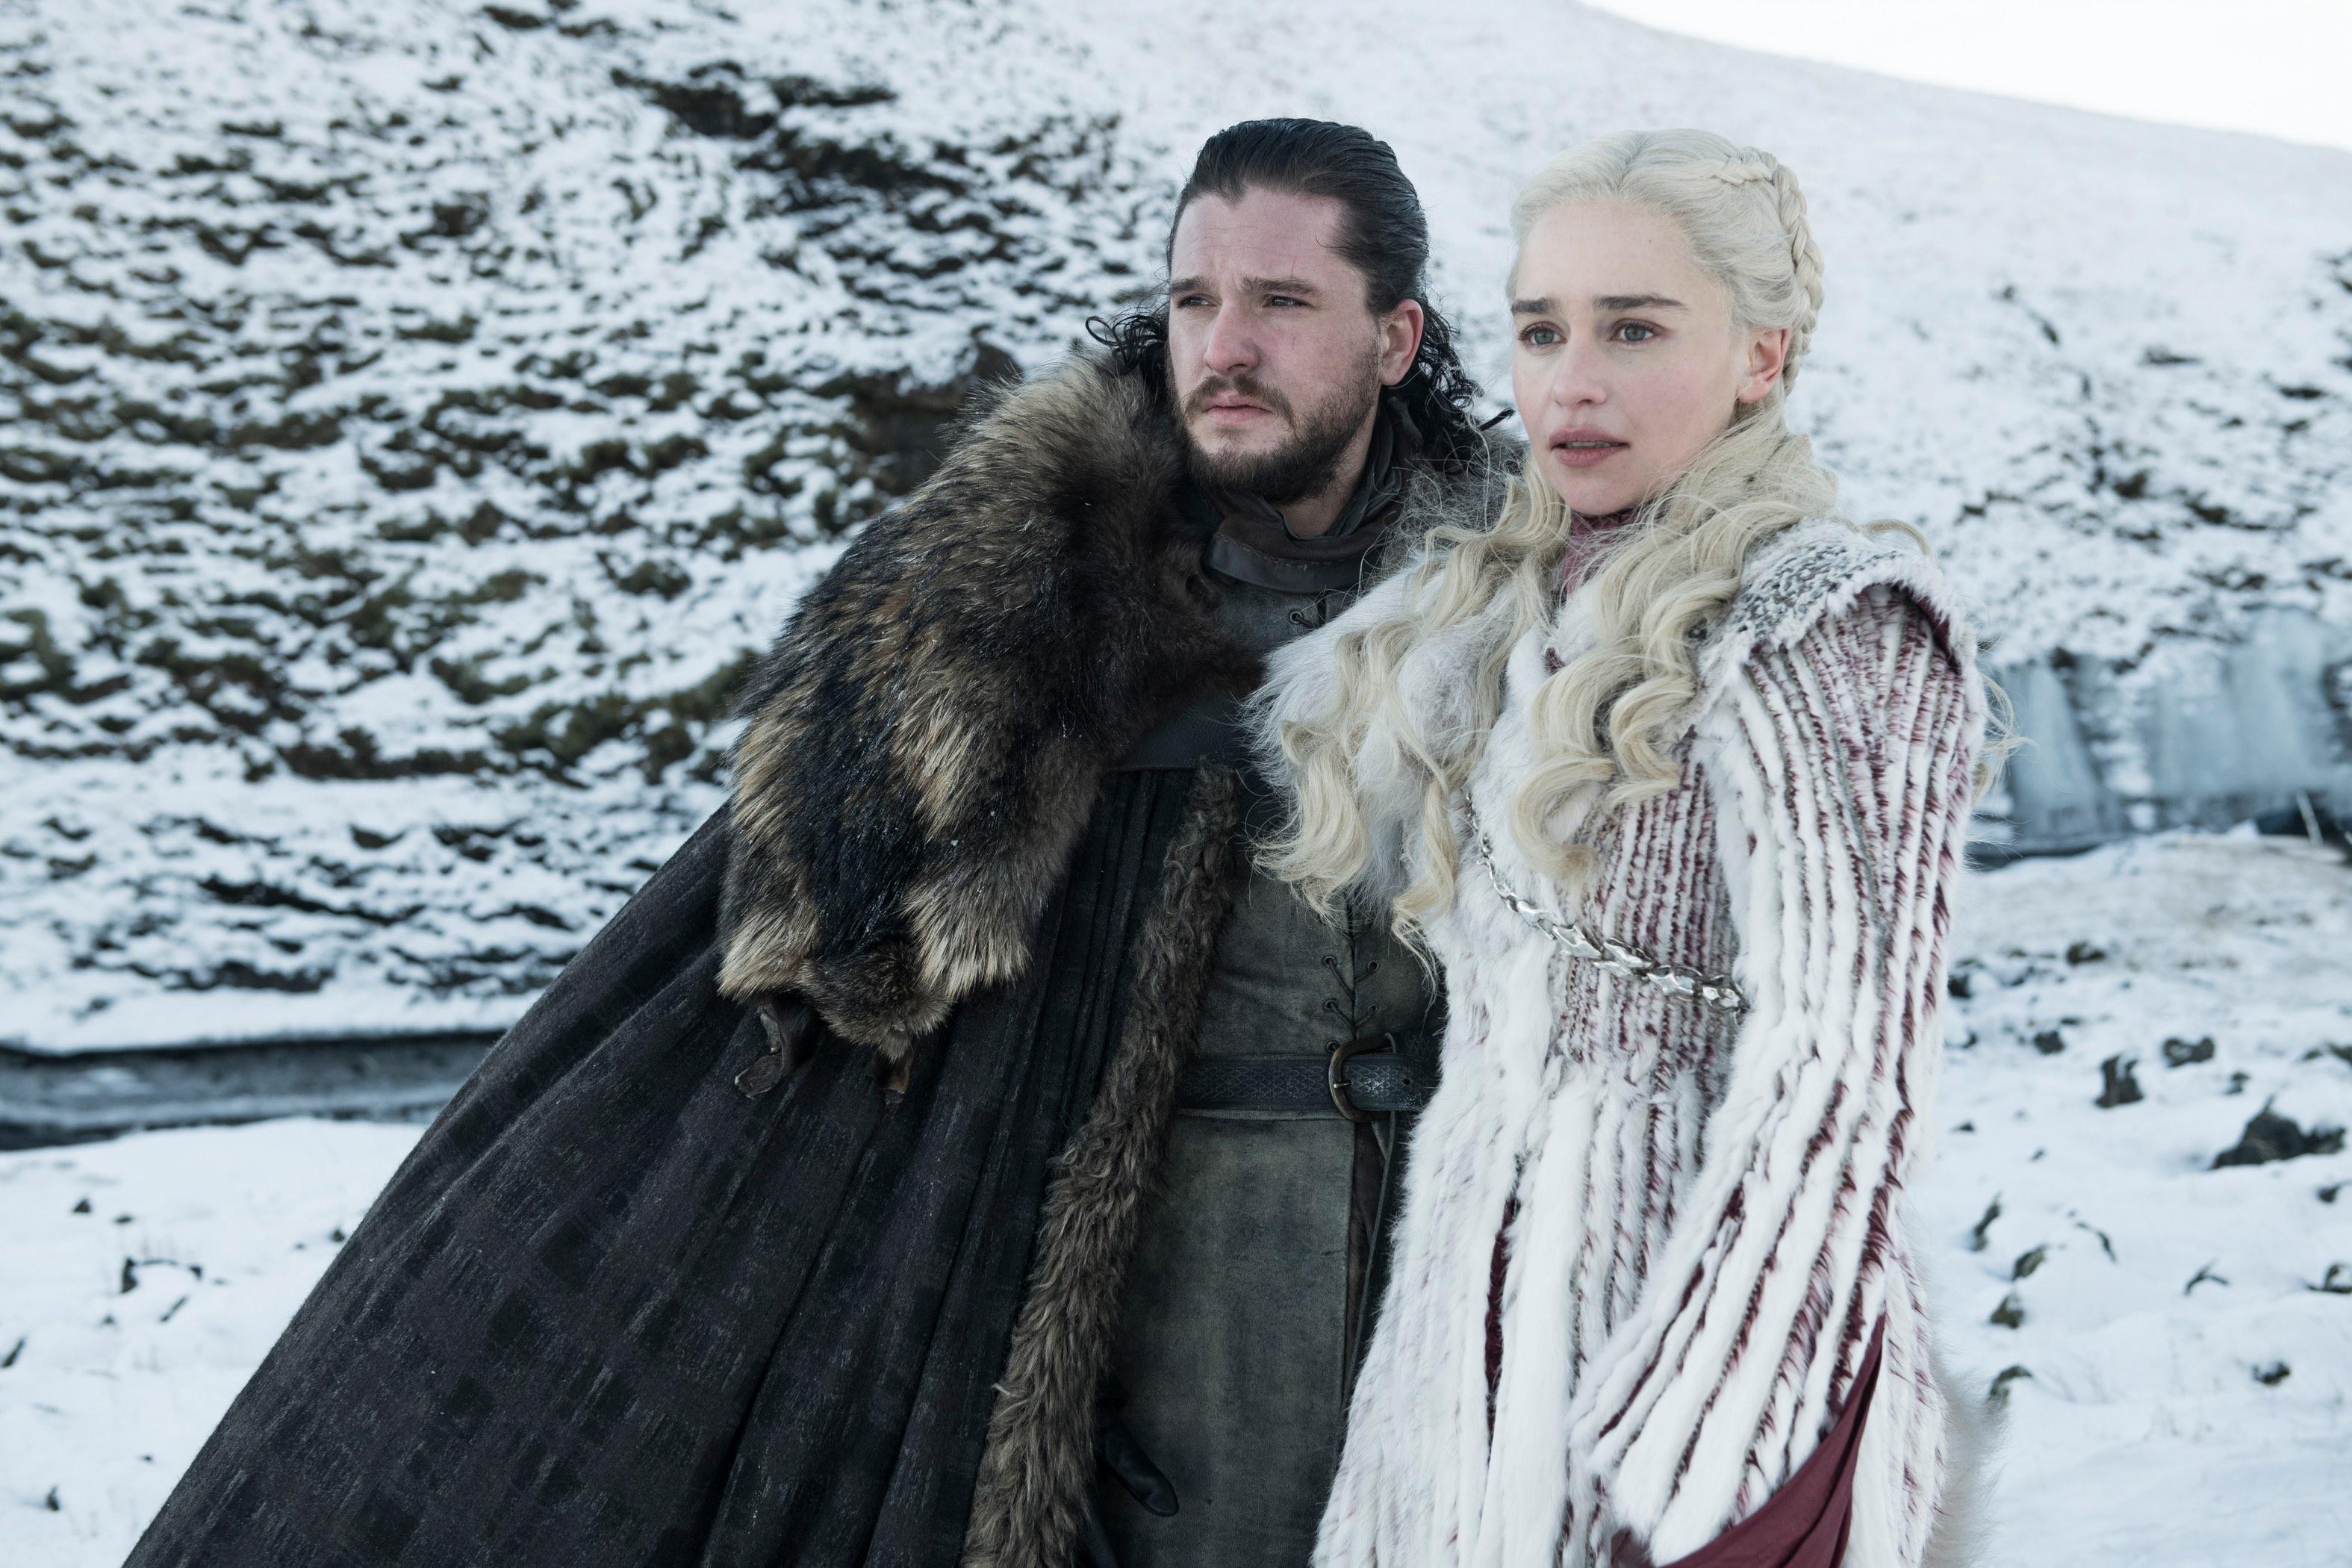 Game of thrones, got, winter, vinter, hbo, stream, streaming